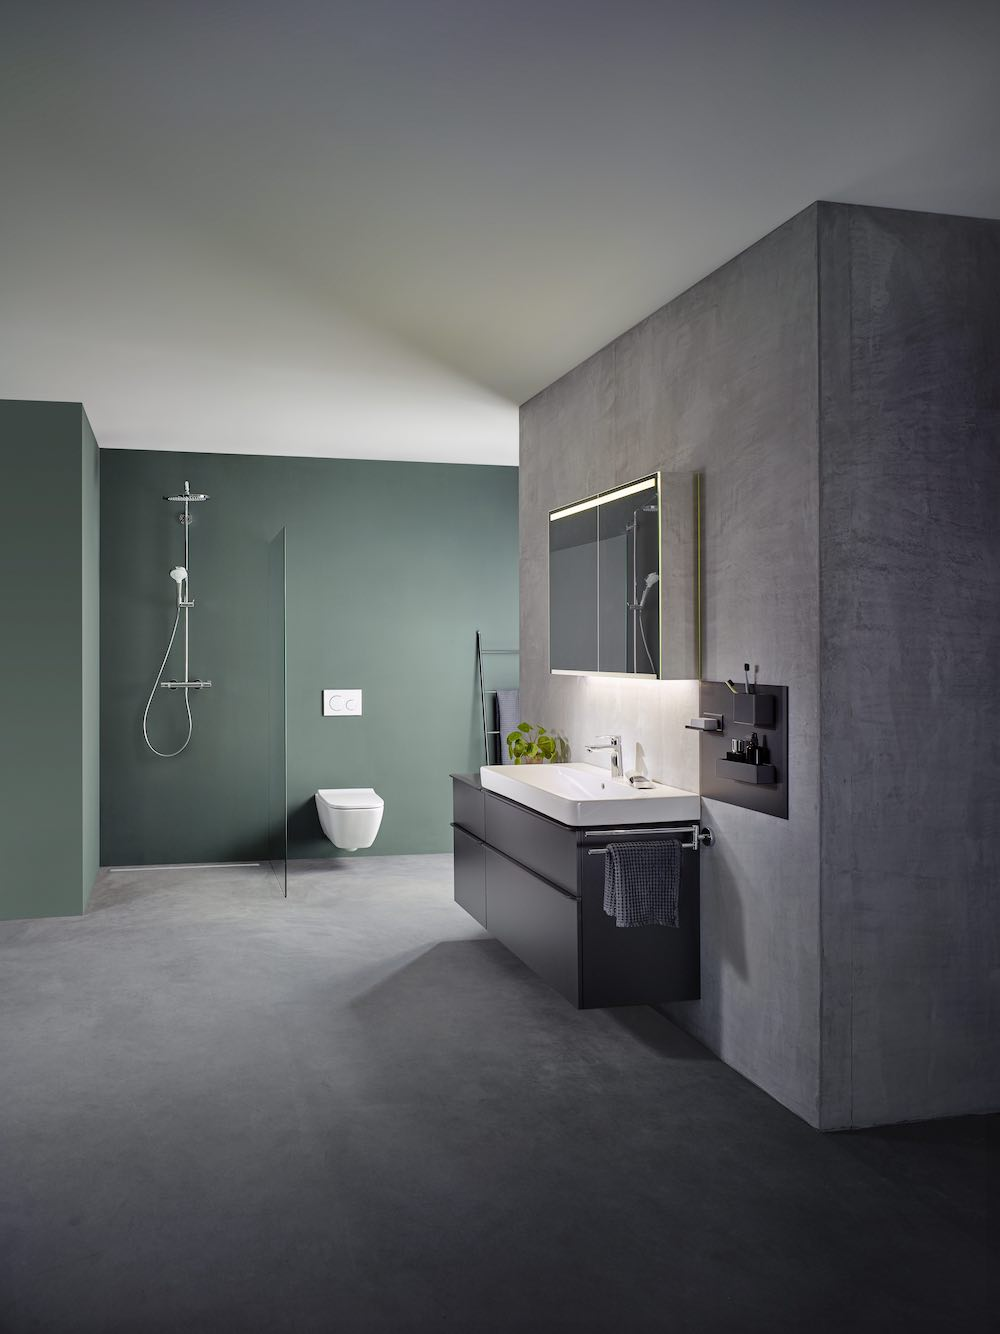 Badkamerserie Geberit Smyle #badkamer #badkamermeubel #toilet #wastafel #geberit #smyle